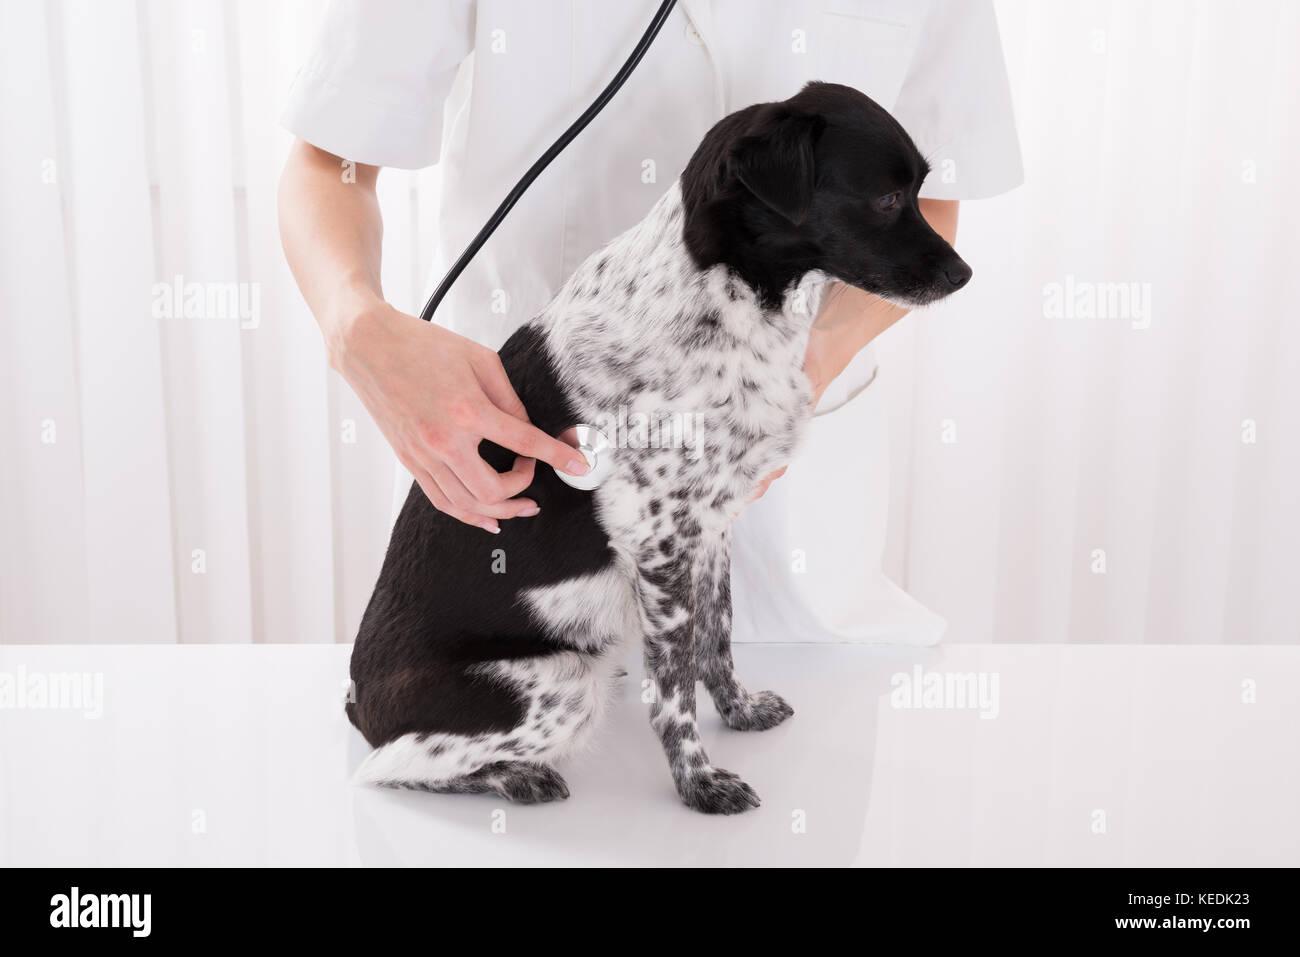 Close-up Of Vet Examining Dog With Stethoscope In Hospital - Stock Image